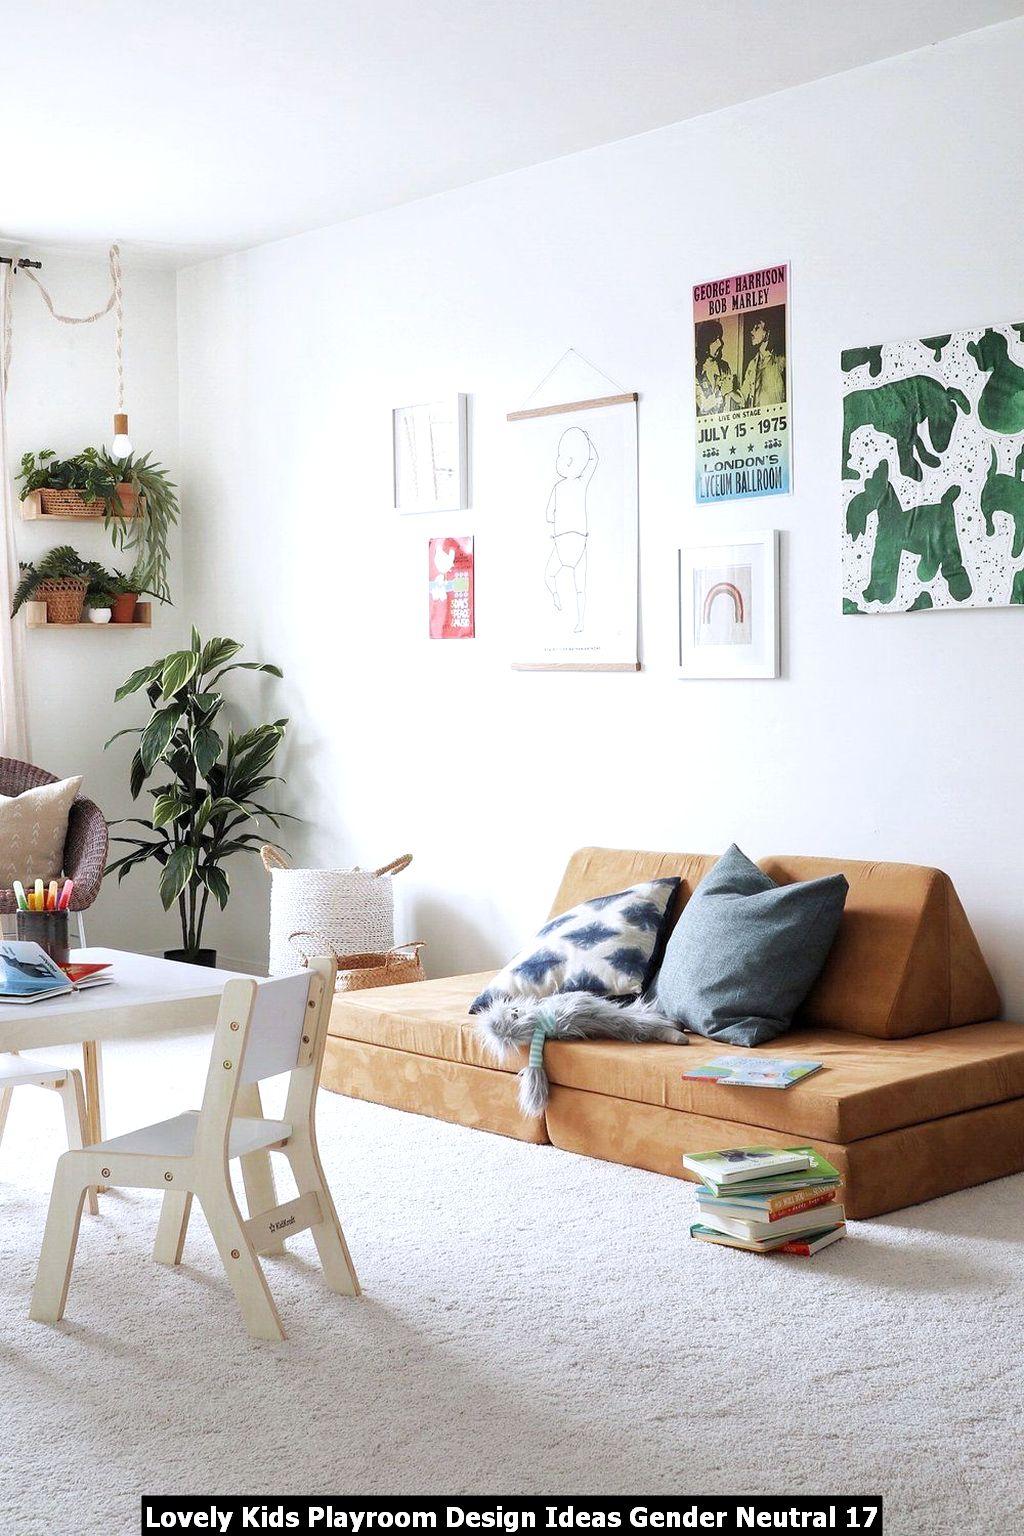 Lovely Kids Playroom Design Ideas Gender Neutral 17